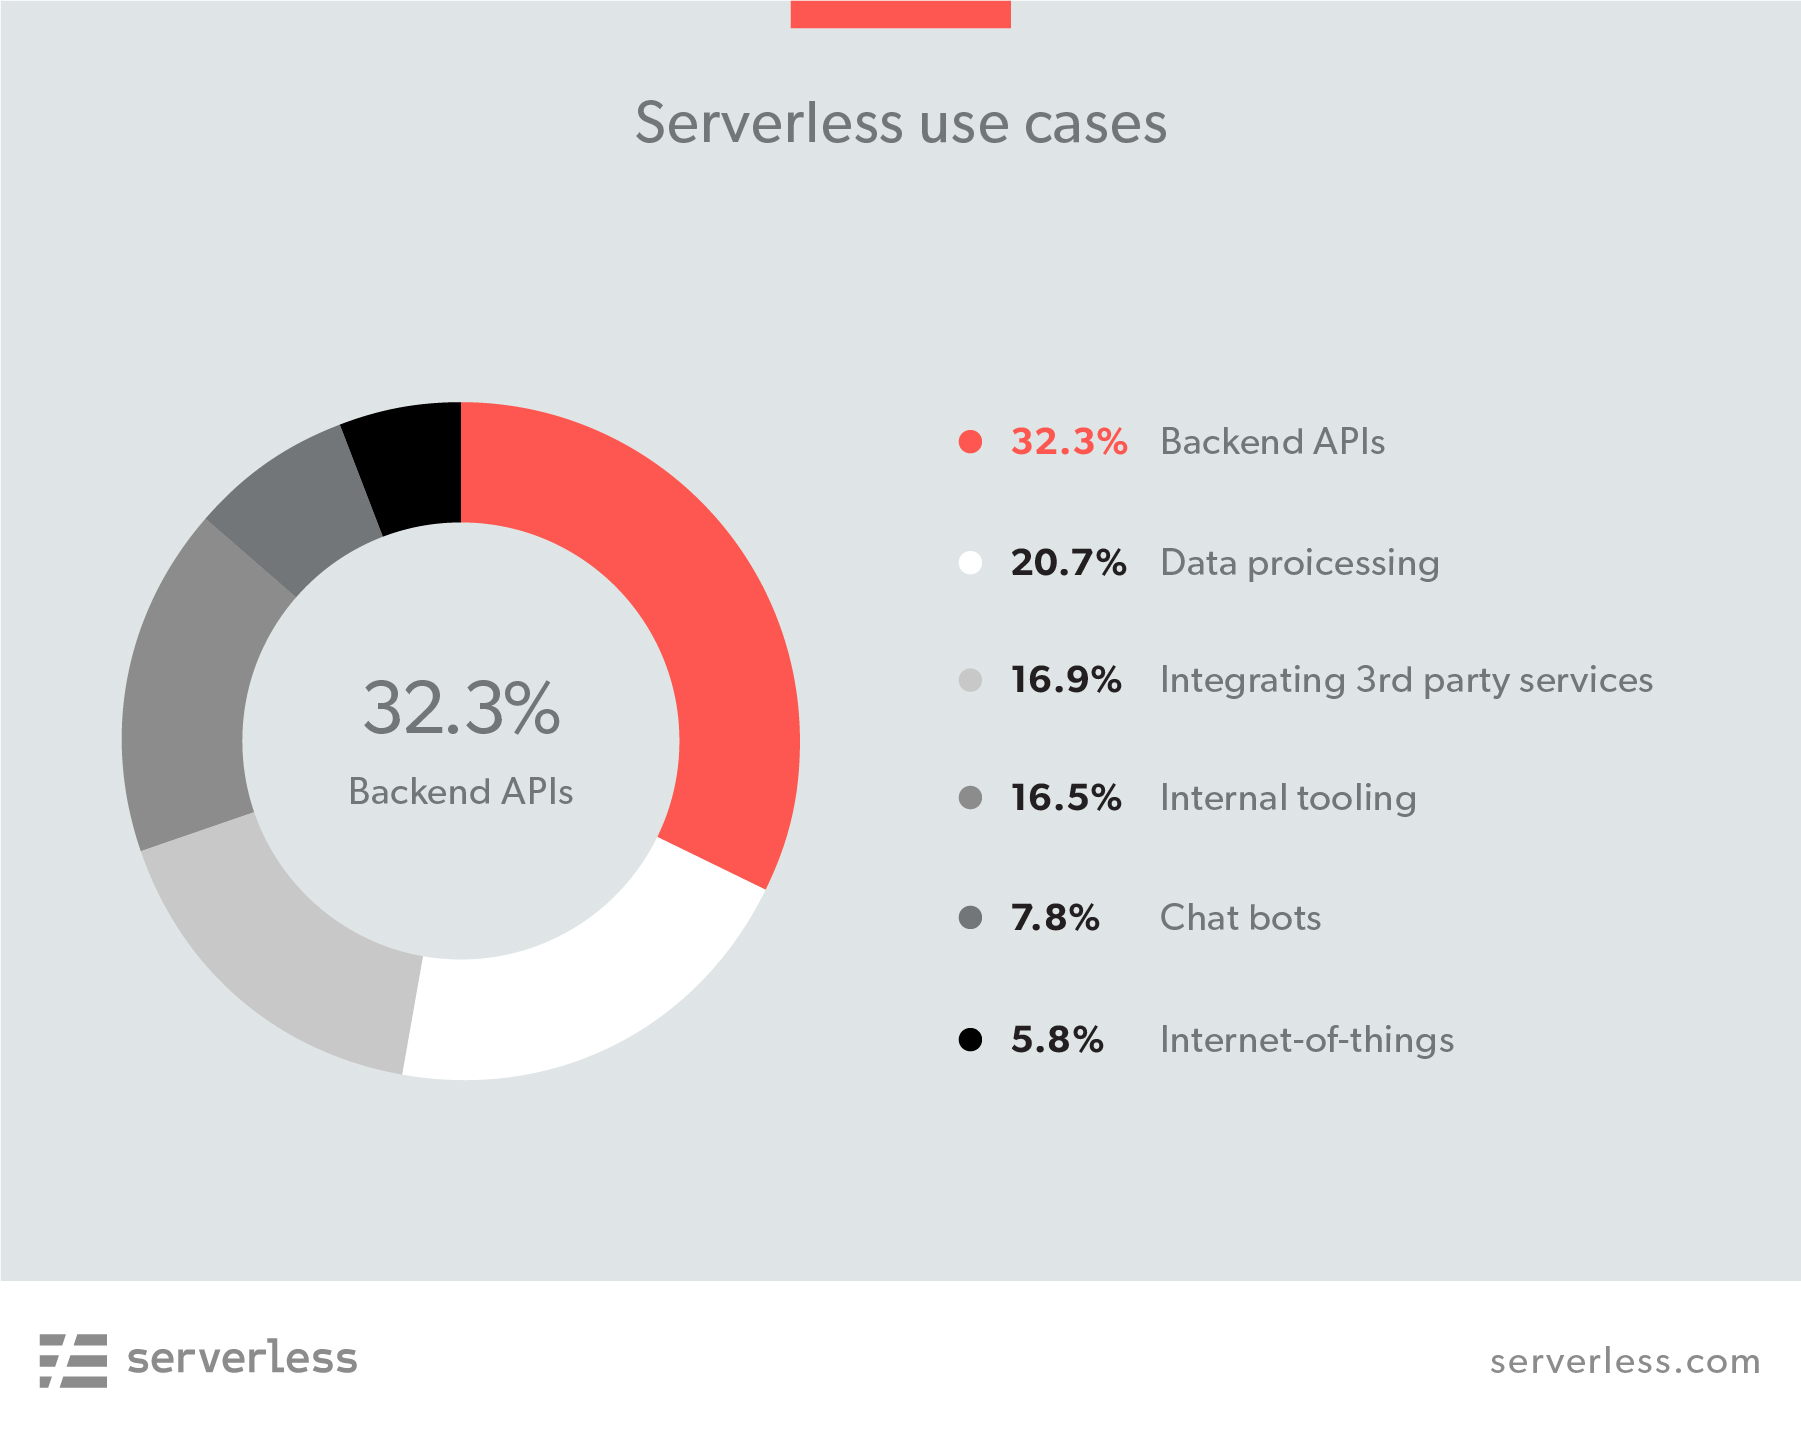 2018 Serverless Community Survey: huge growth in serverless